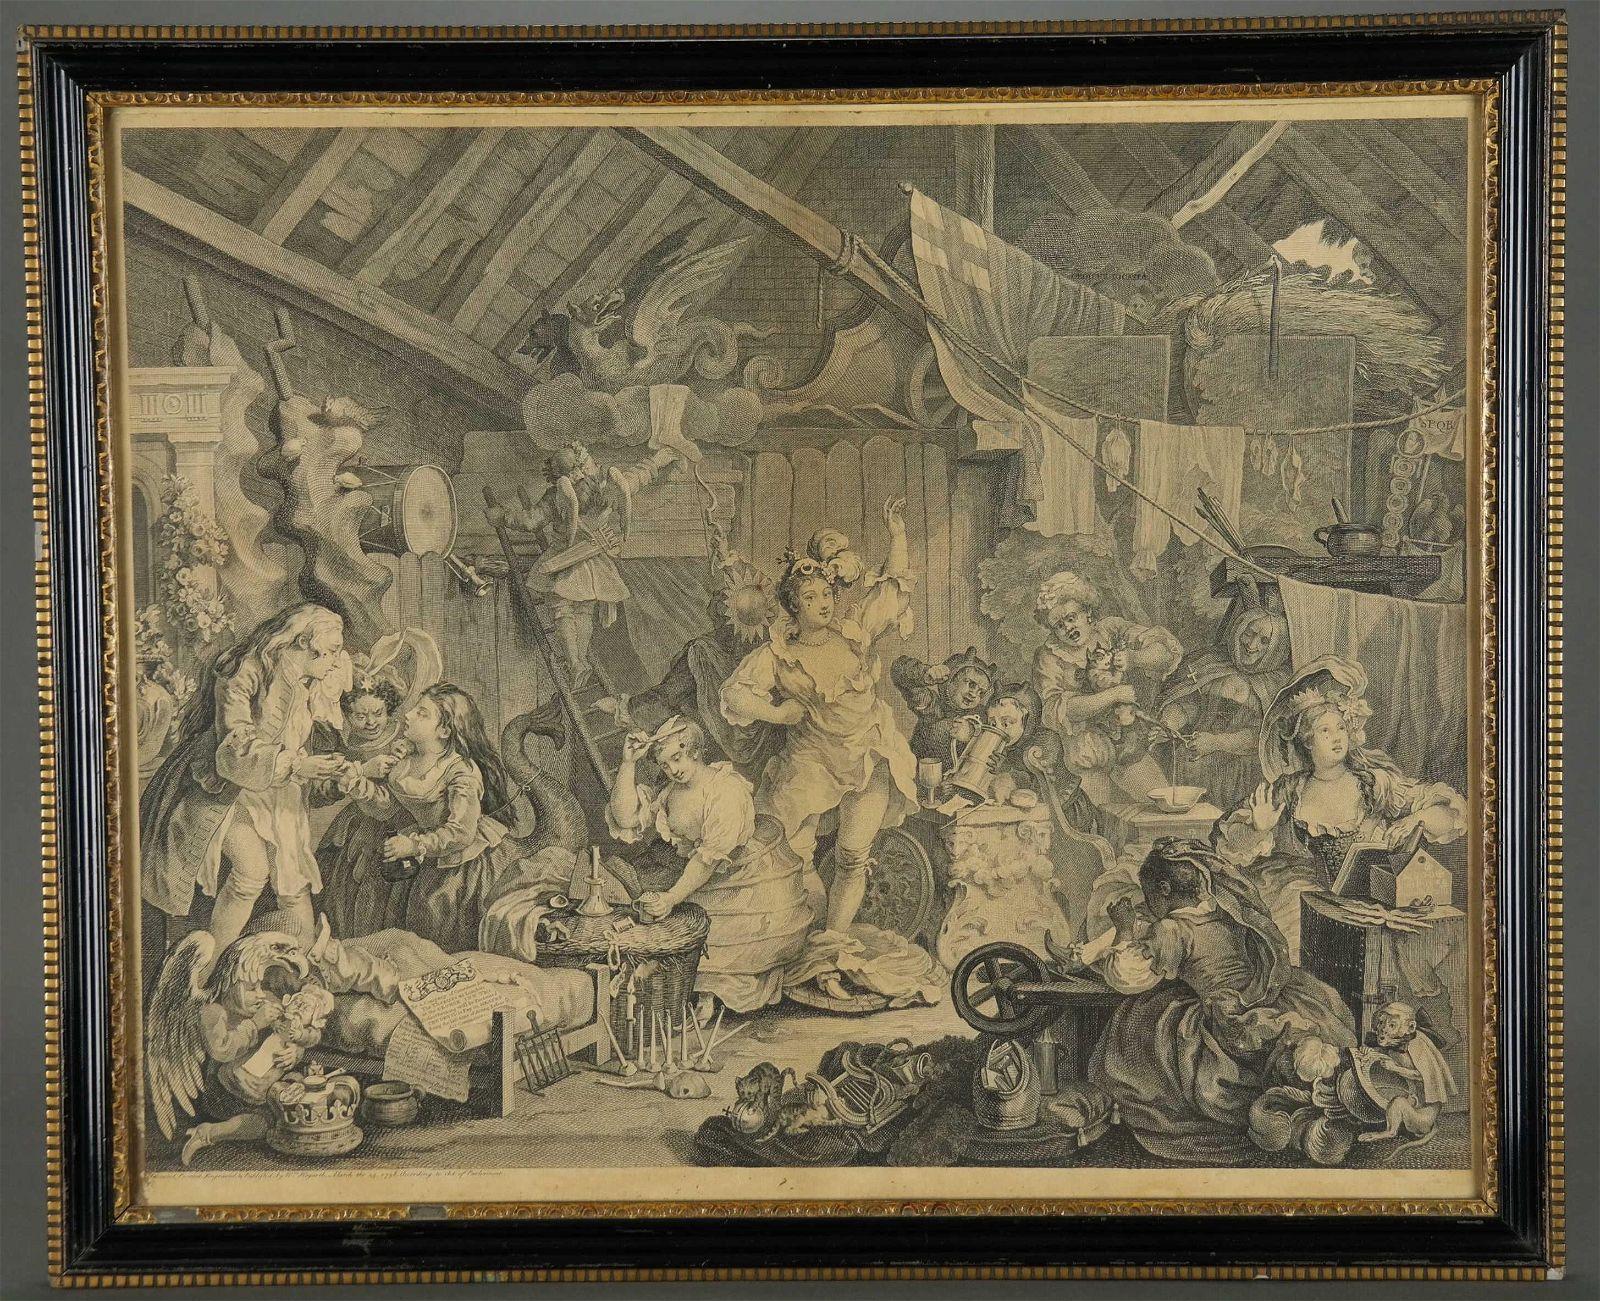 Pair of Hogarth Prints. O Roast Beef, Strolling.